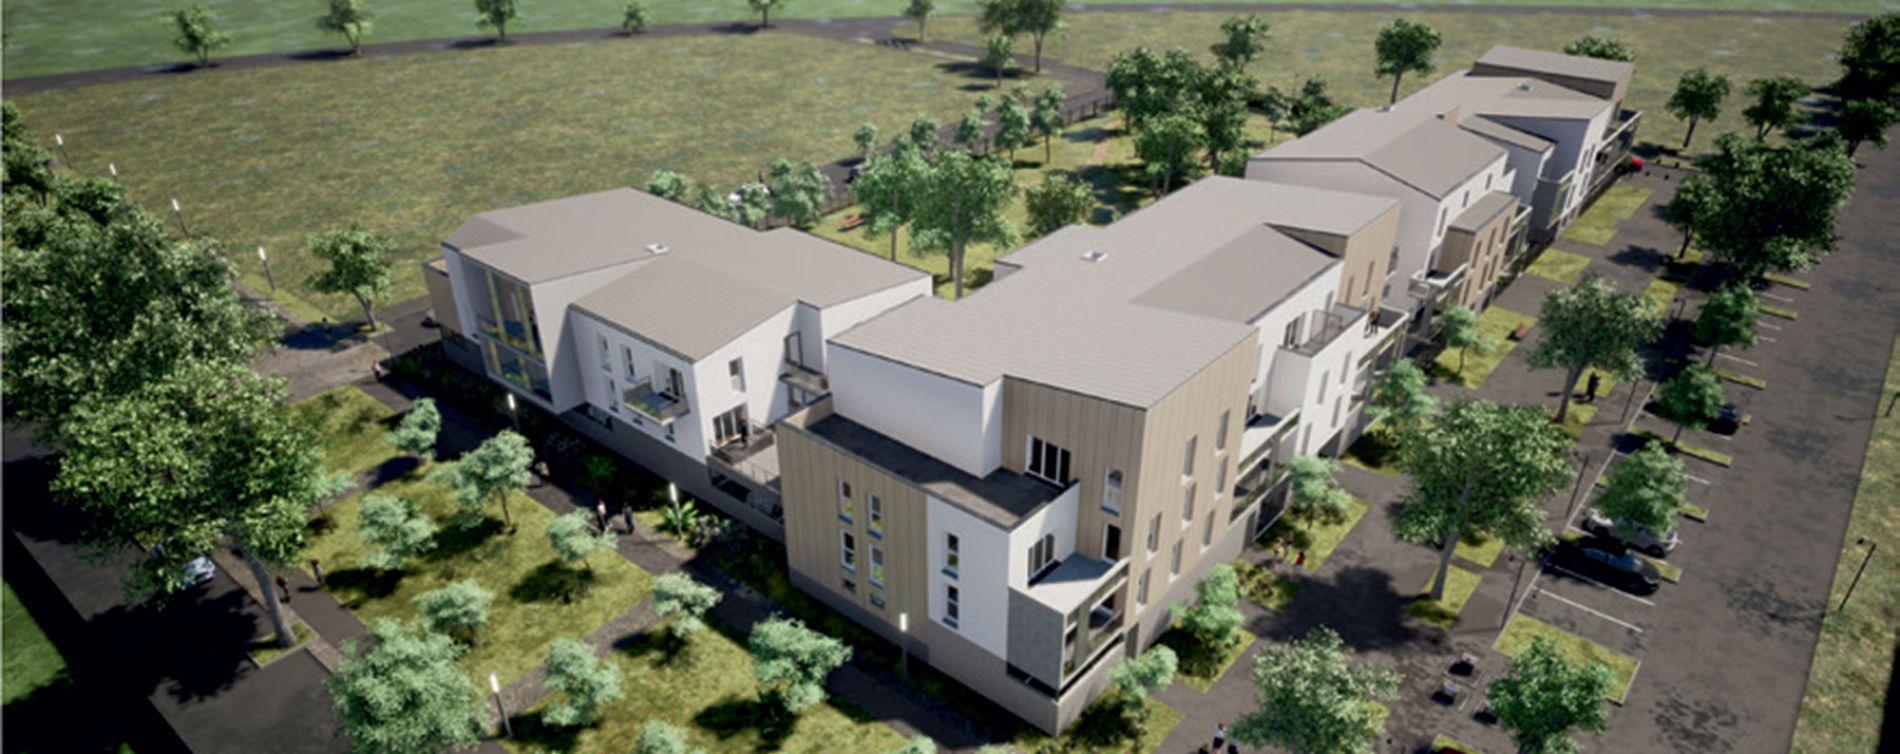 Chartres : programme immobilier neuve « Renouv'O » (2)